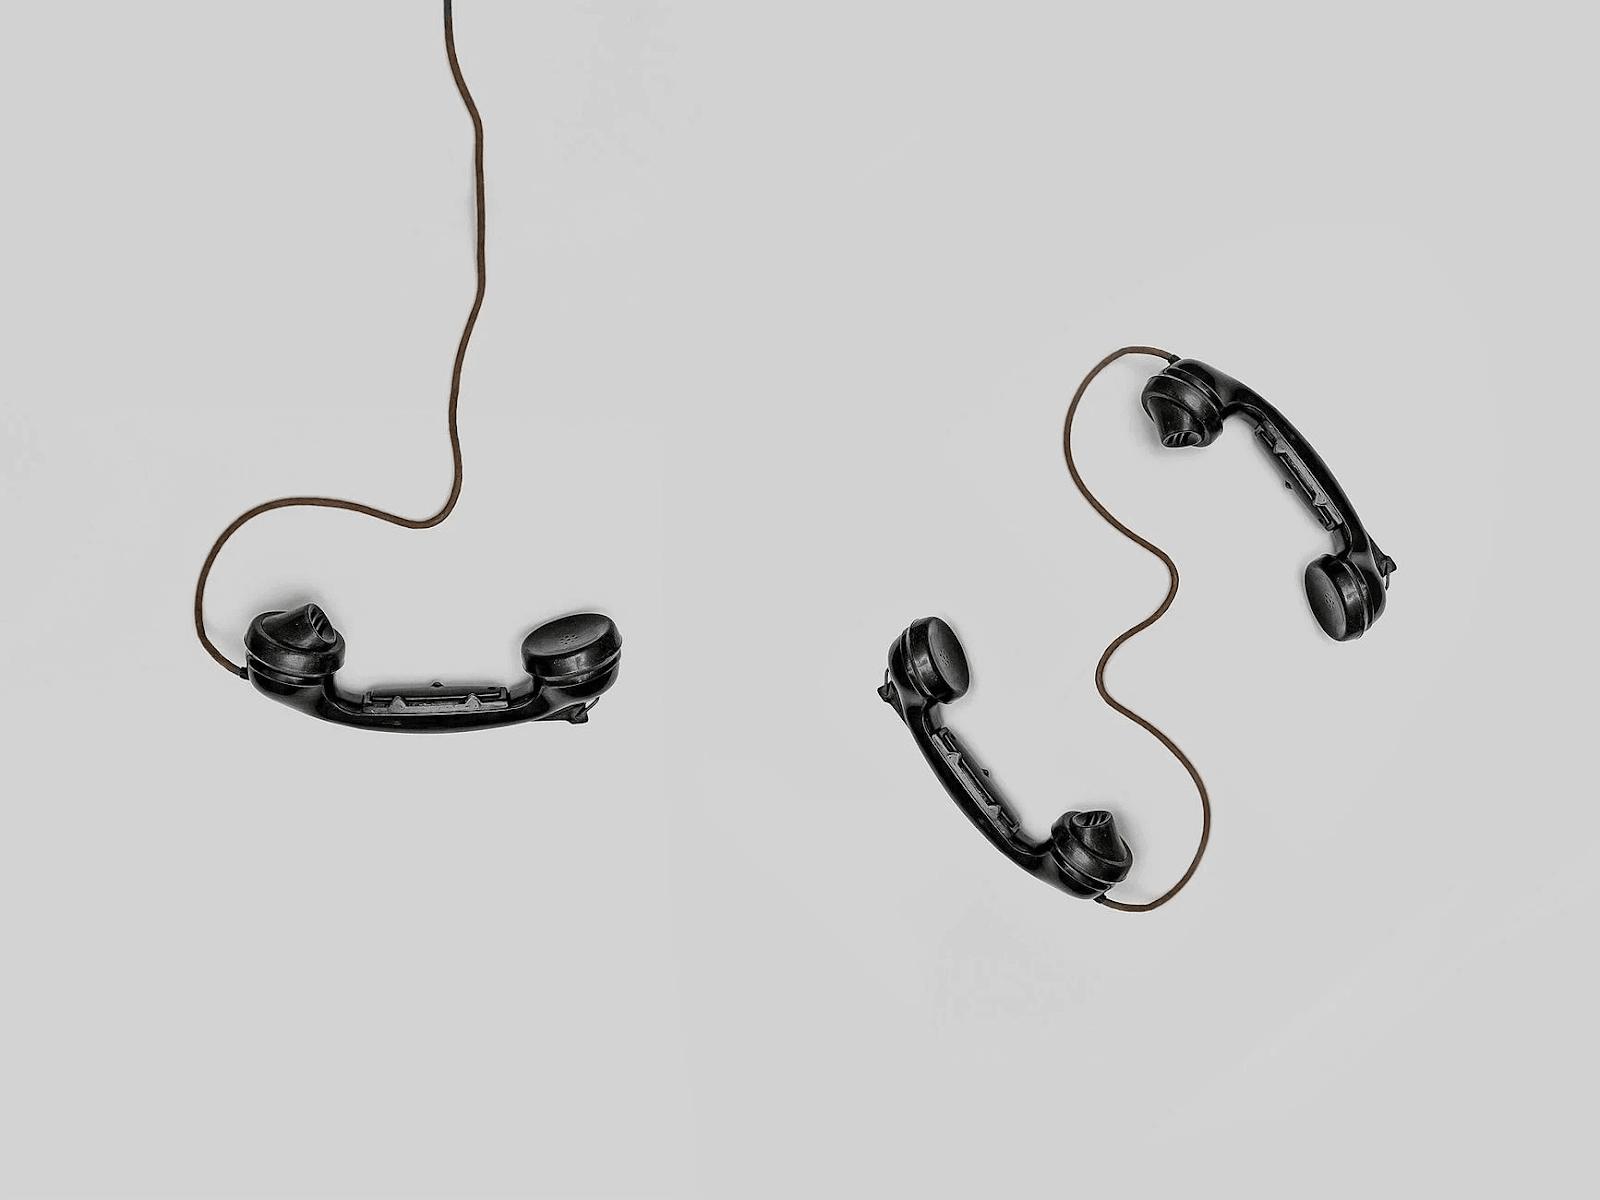 Establish a Two-Way Communication